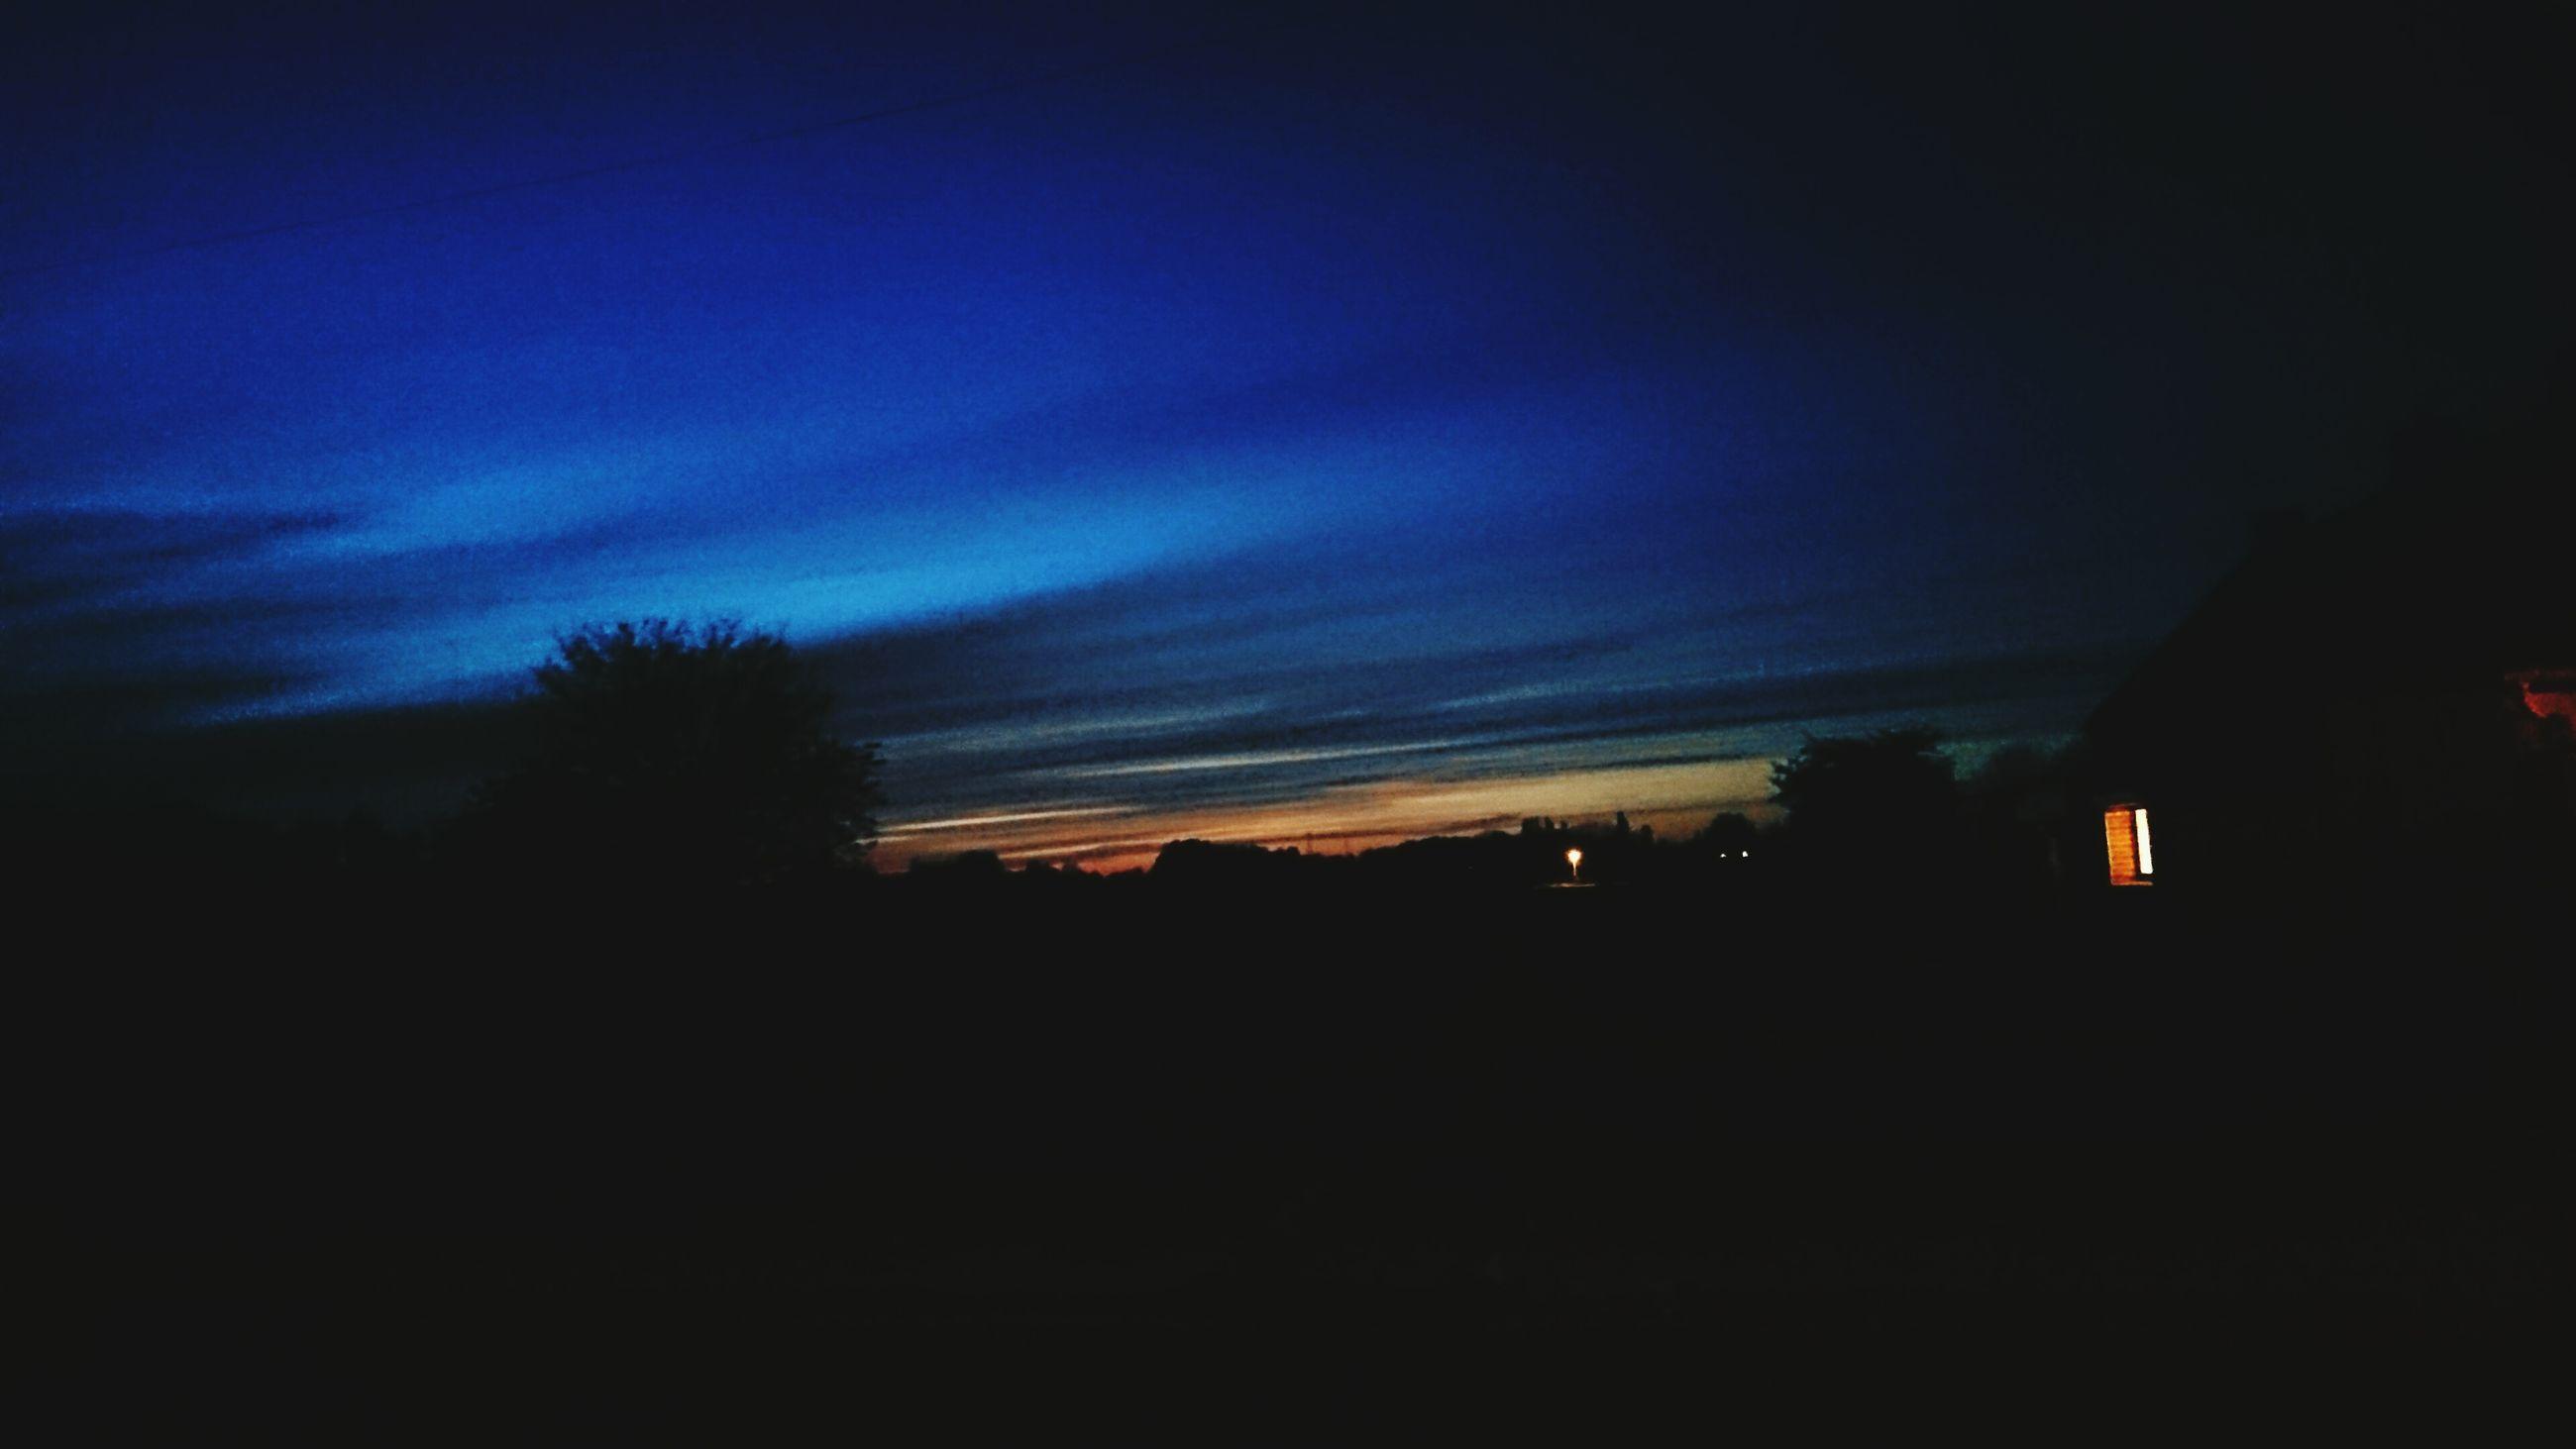 silhouette, sunset, sky, scenics, dark, beauty in nature, tranquility, tranquil scene, tree, cloud - sky, nature, dusk, landscape, copy space, idyllic, built structure, cloud, dramatic sky, orange color, outline